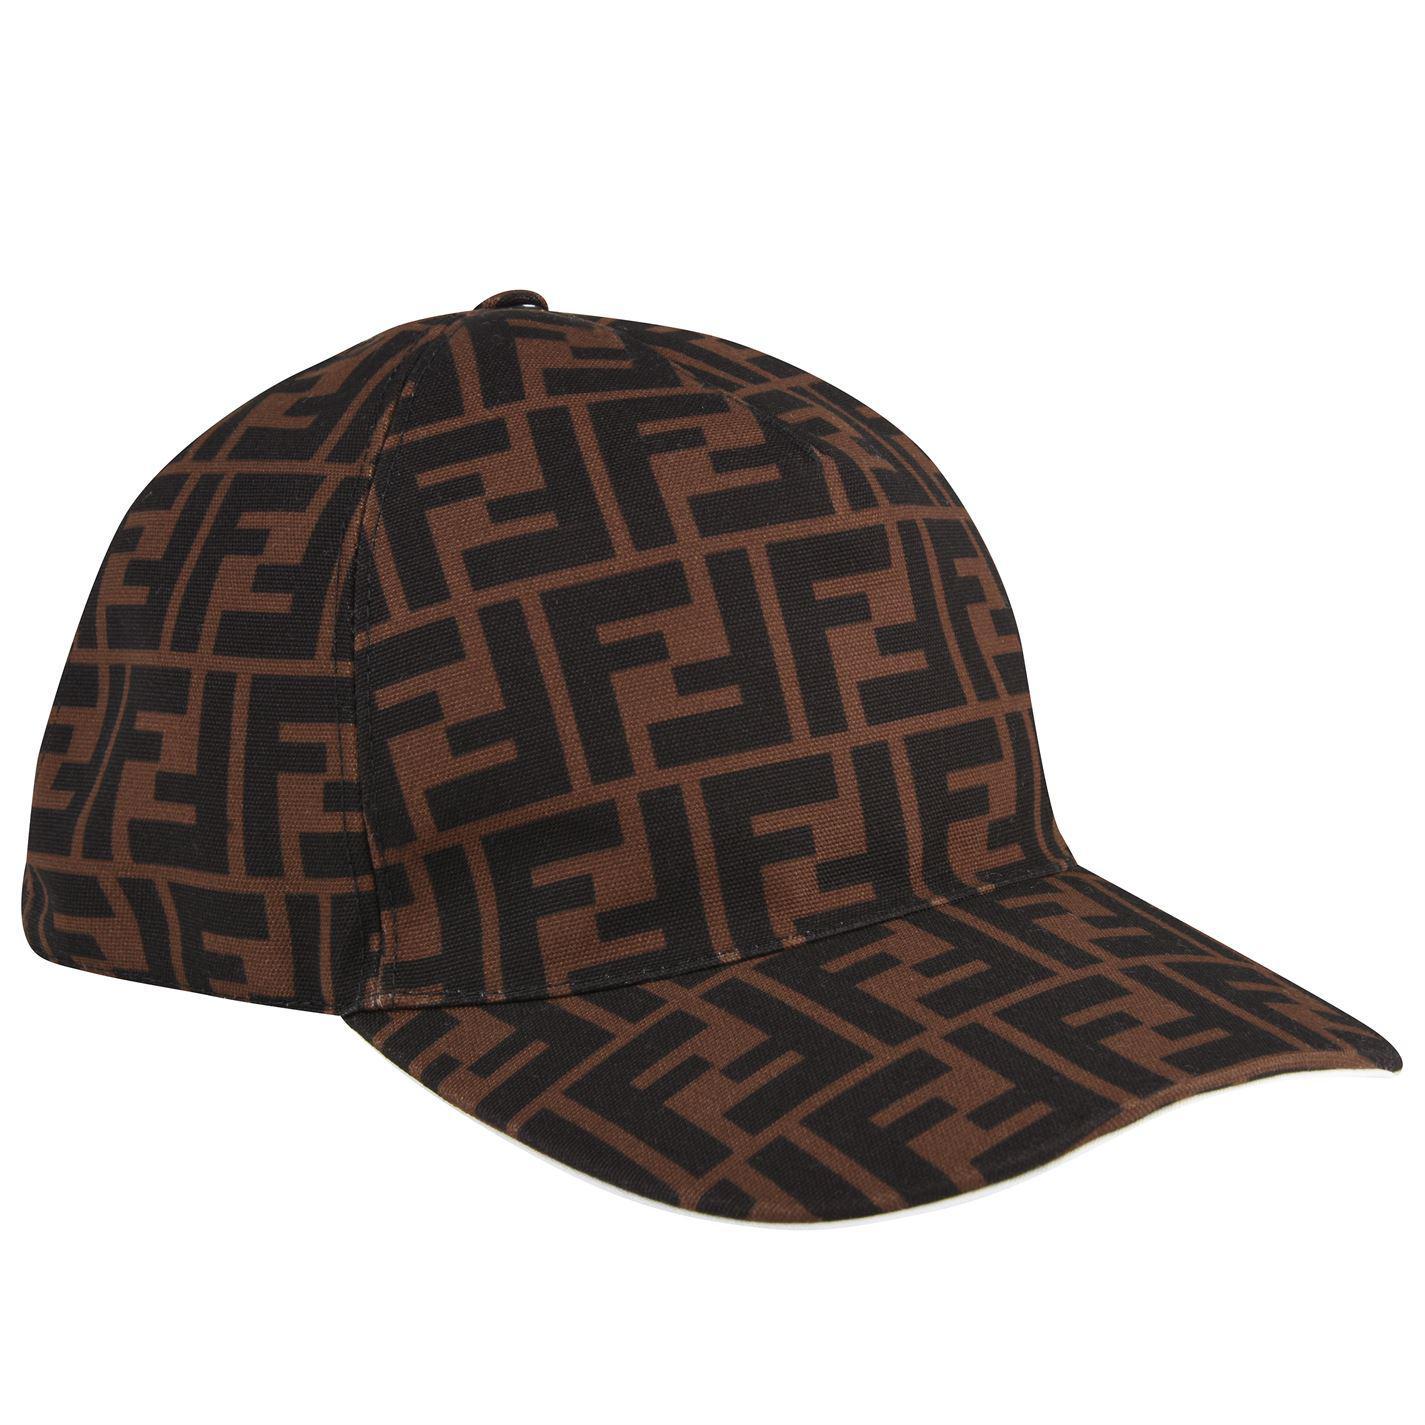 8709f284f08 Lyst - Fendi Ff Cap in Brown for Men - Save 33%